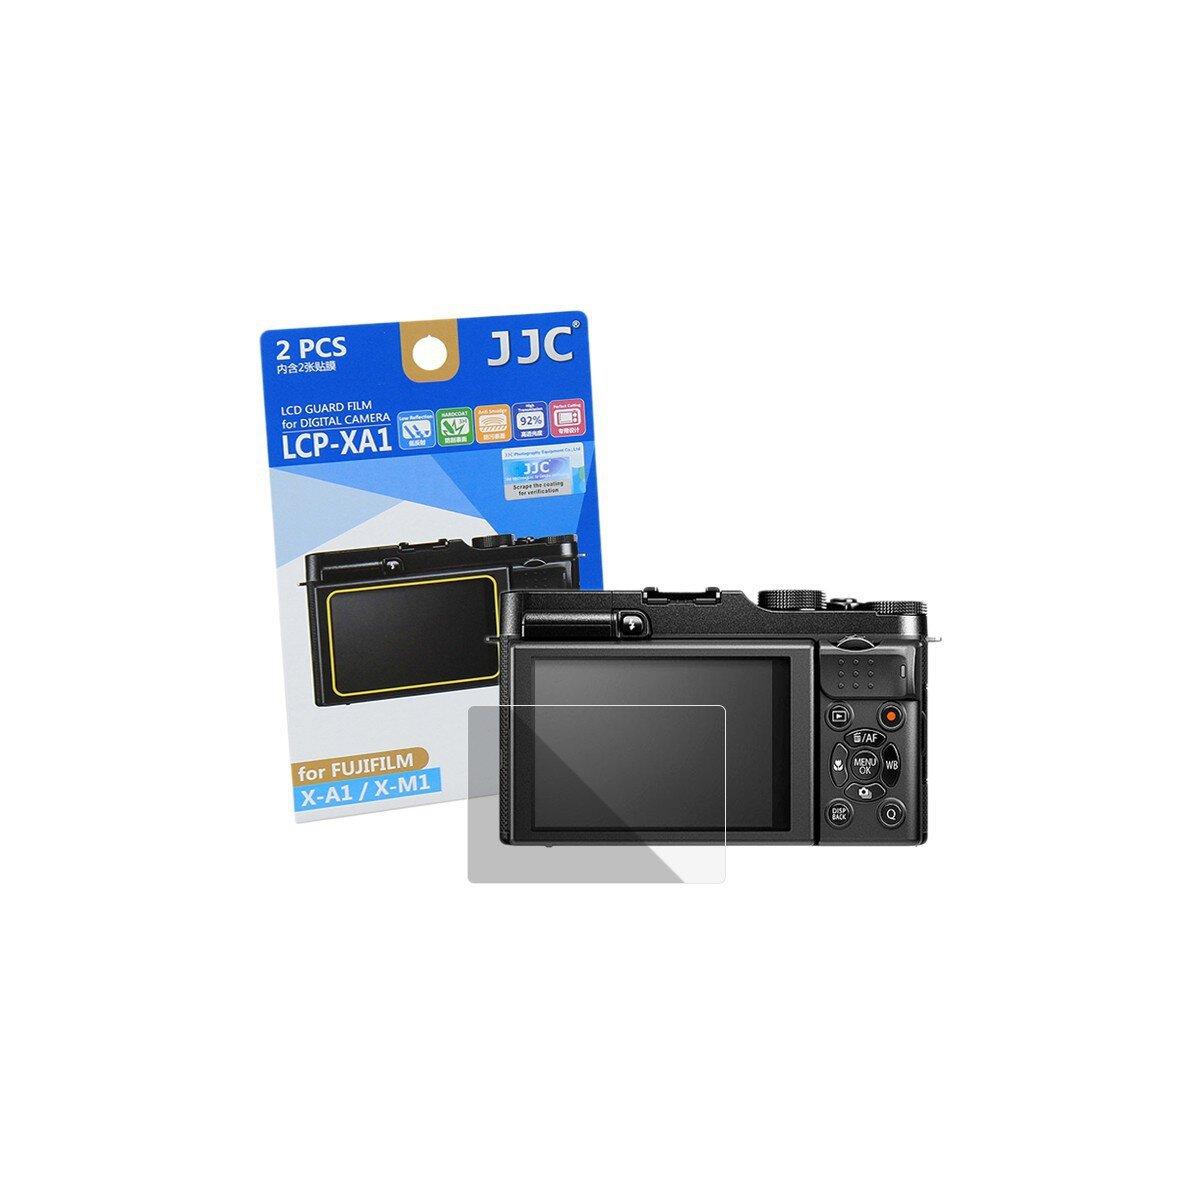 JJC Displayschutzfolie Screen Protector Kratzschutz passgenau fuer Fujifilm X-A1, X-M1 - LCP-XA1